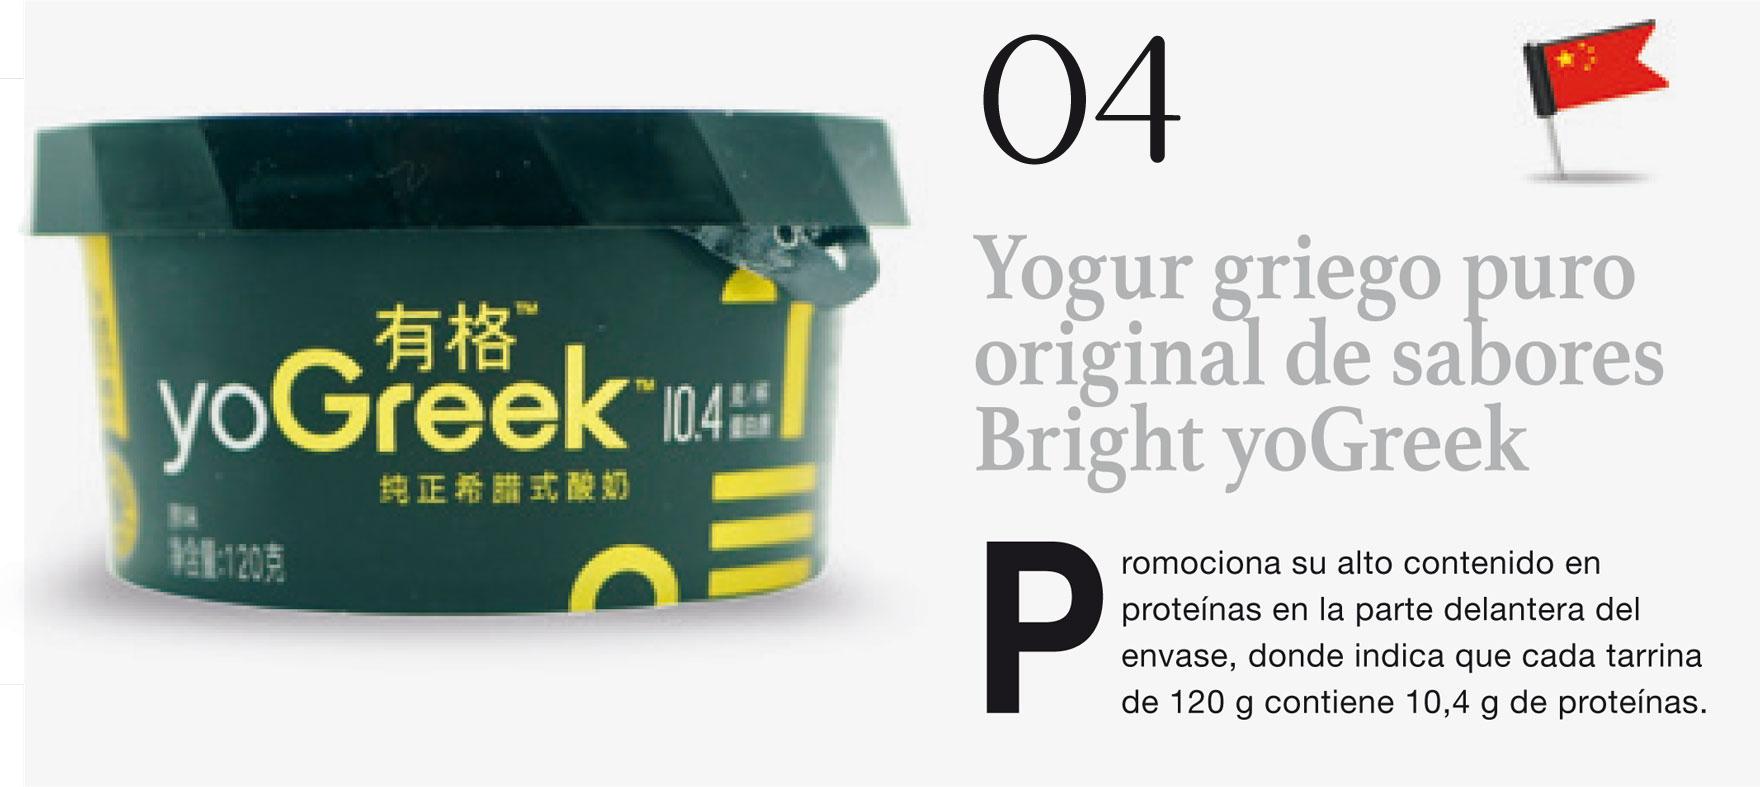 Yogur griego puro original de sabores Bright yoGreek